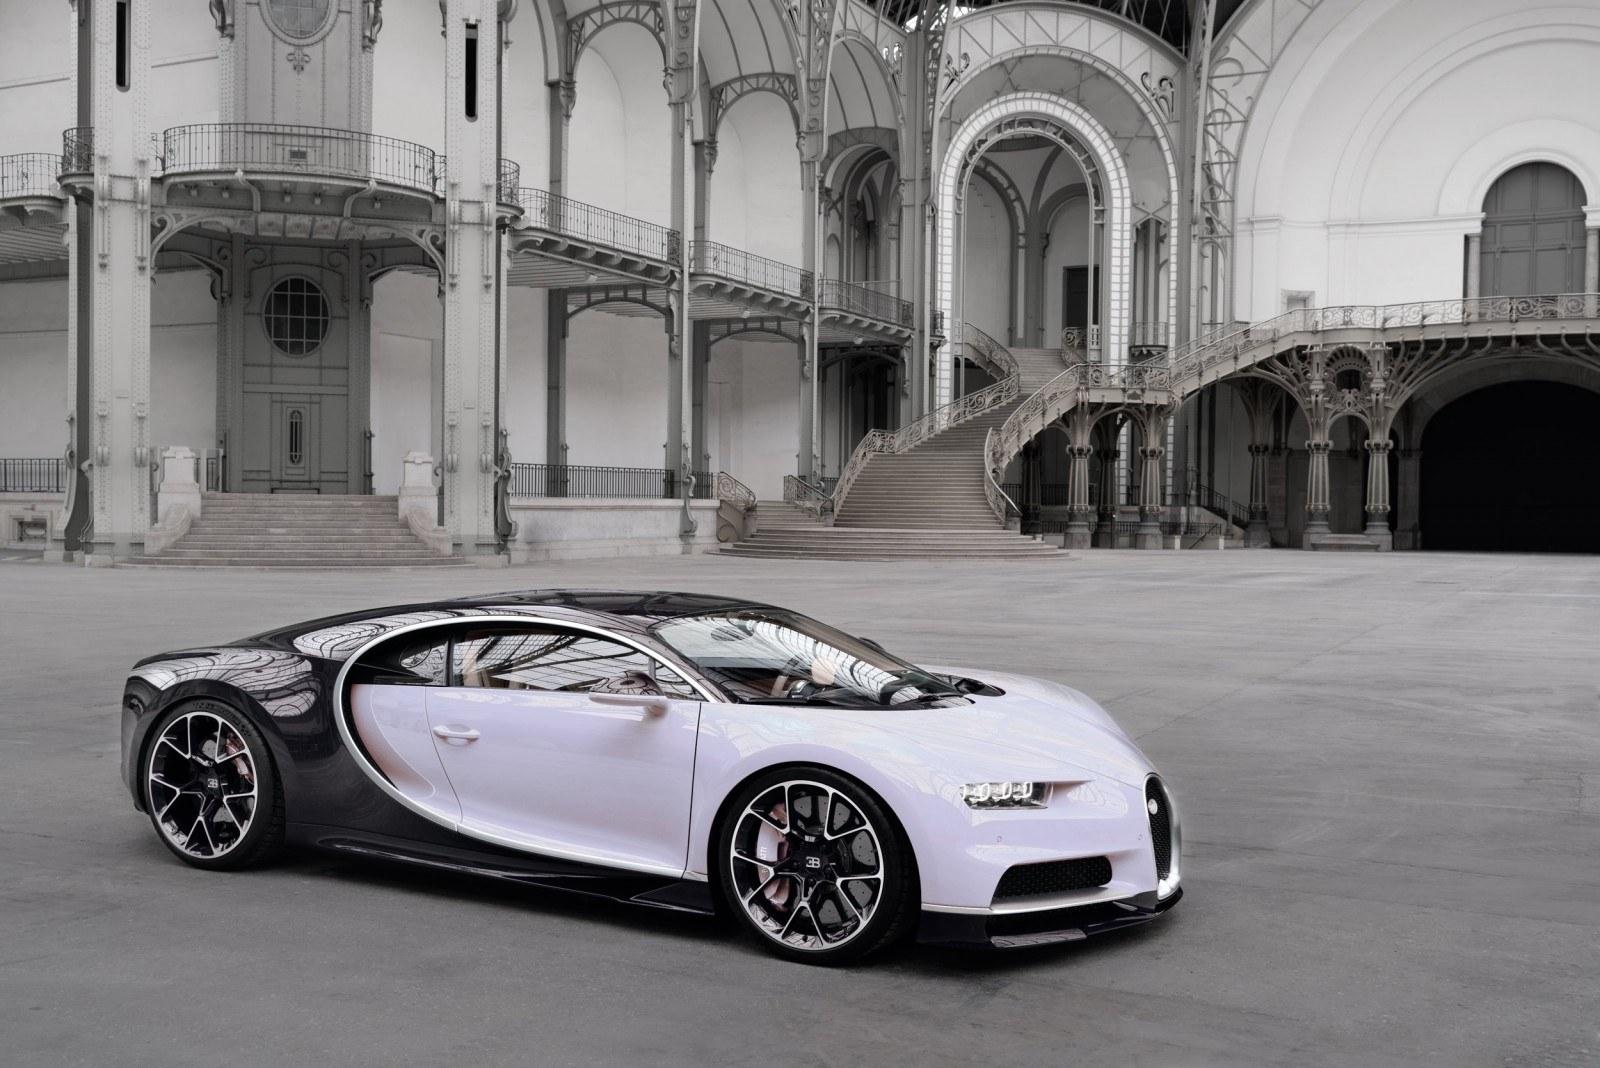 2017 Bugatti Chiron Colors Visualizer 50 Shades Of 300mph Boss Car Revs Daily Com